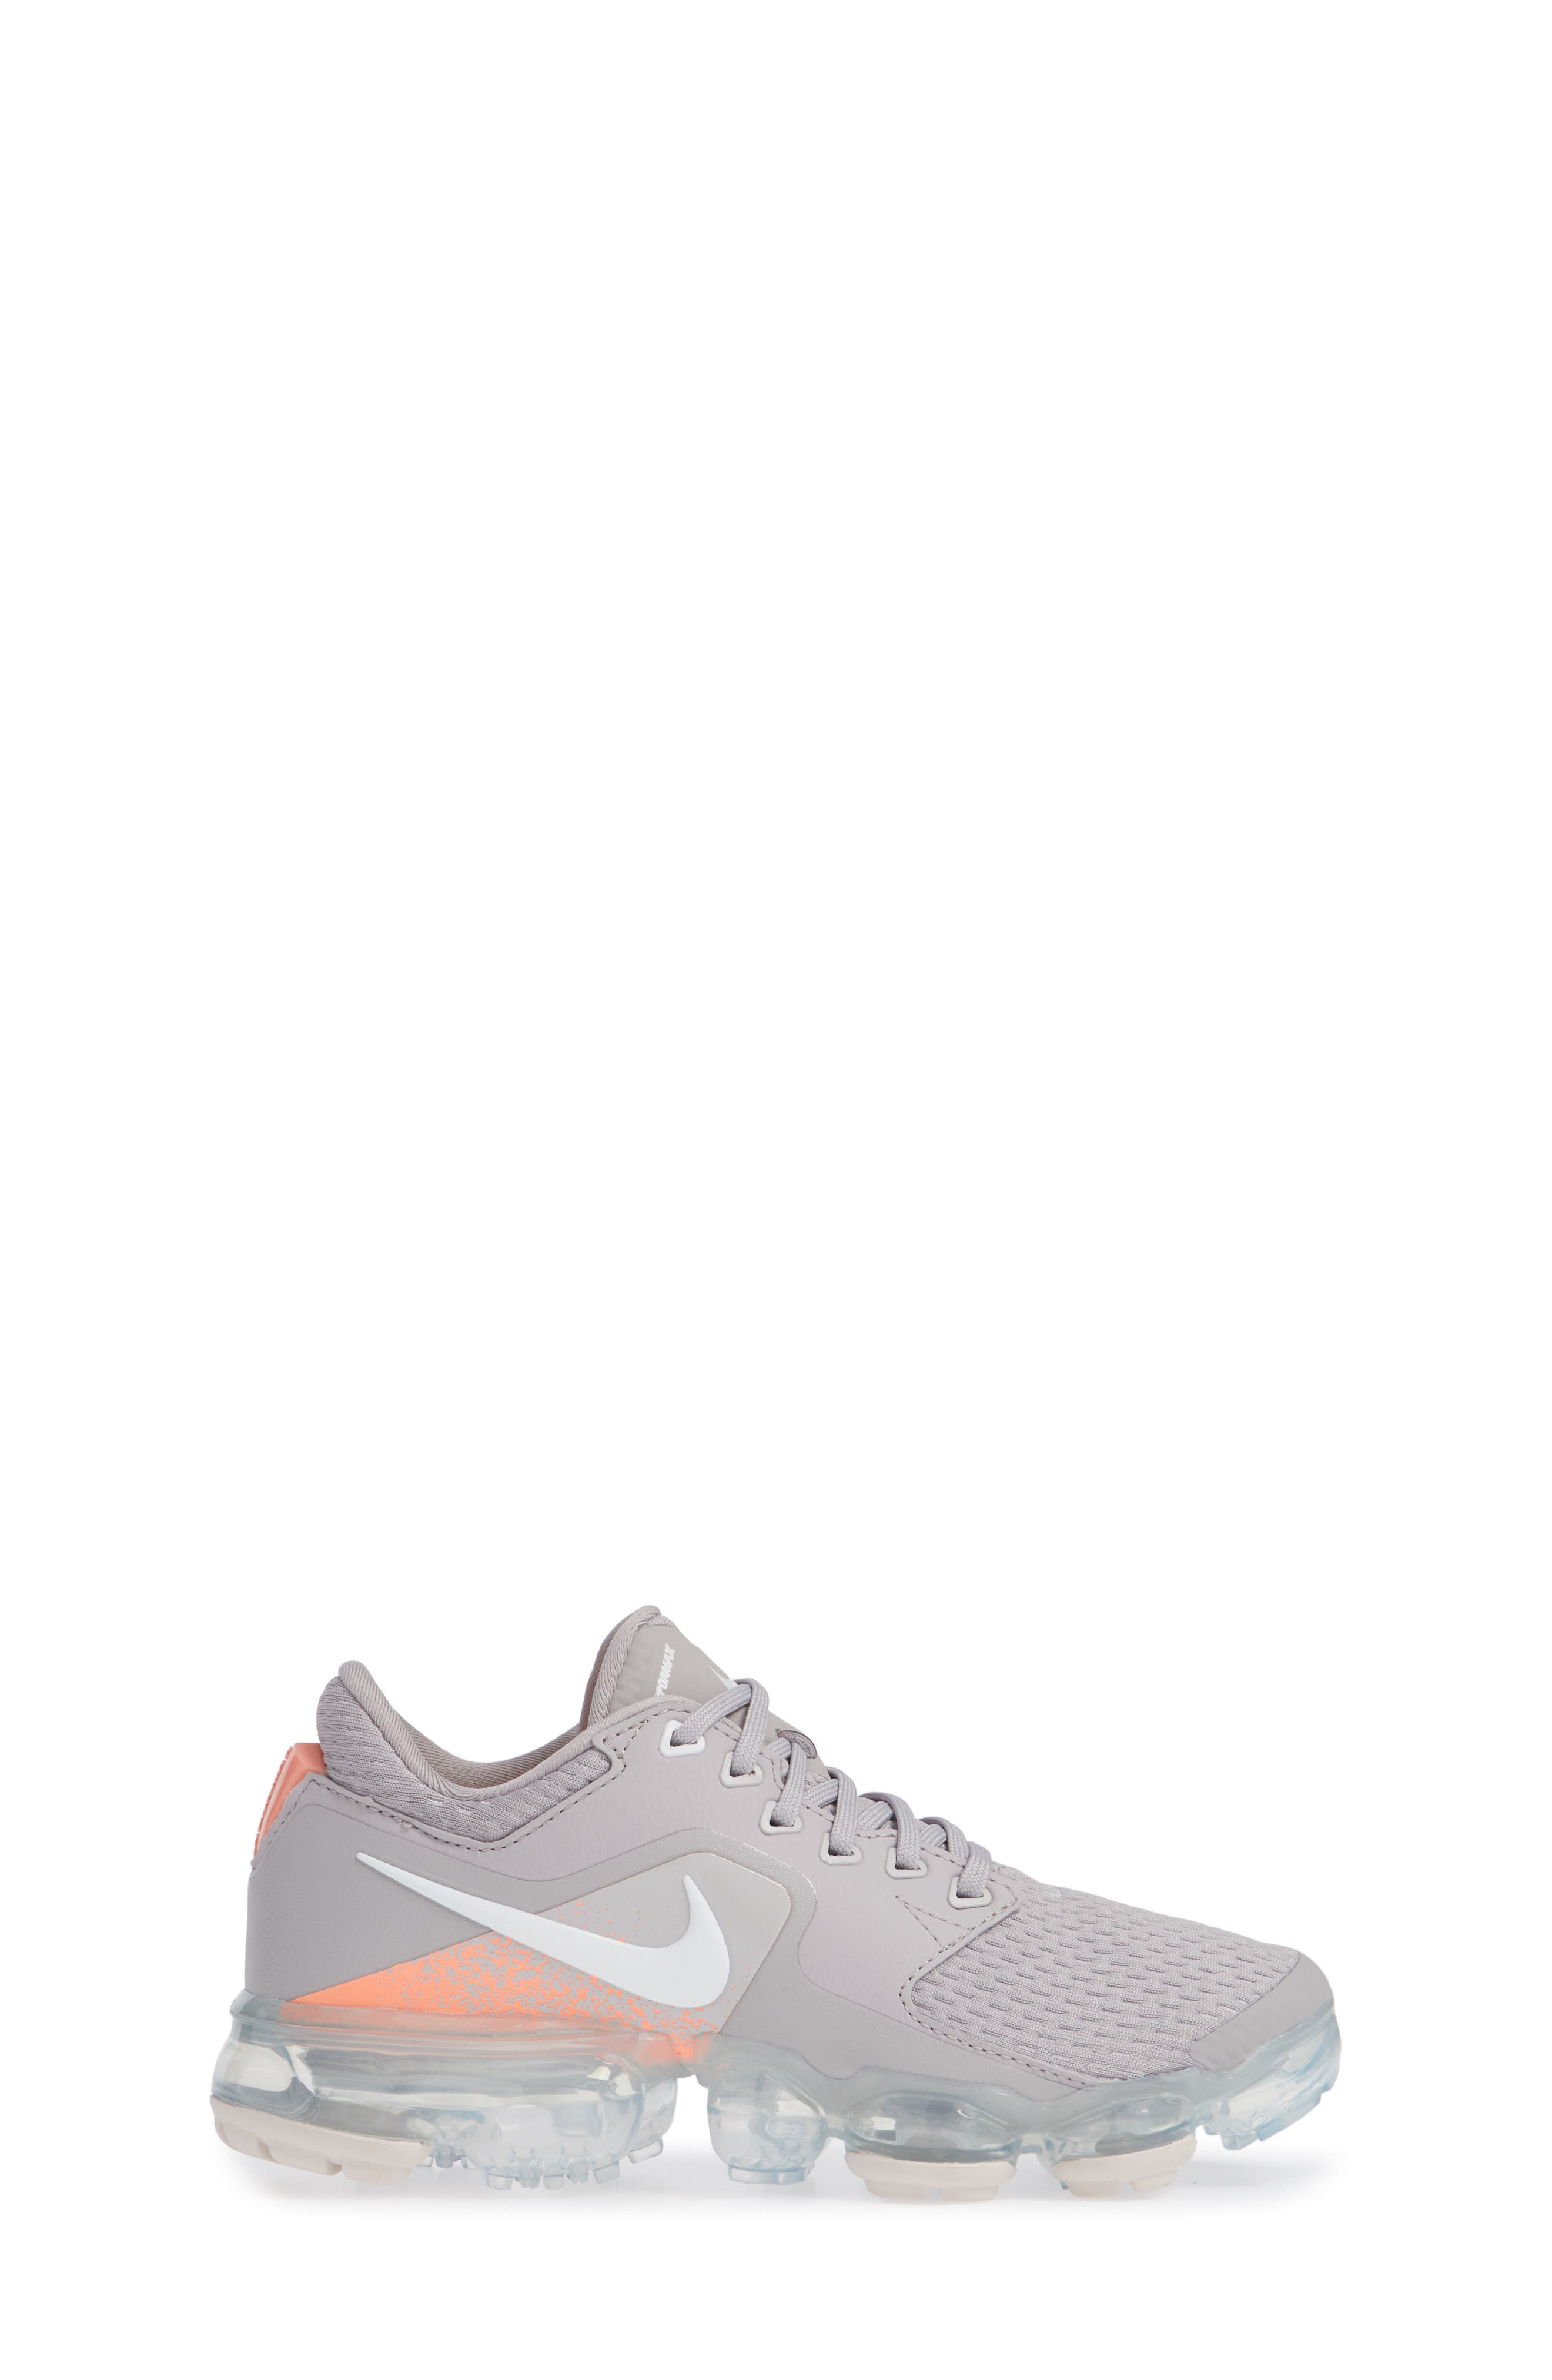 Air VaporMax GS Running Shoe,                             Alternate thumbnail 3, color,                             ATMOSPHERE GREY/ WHITE